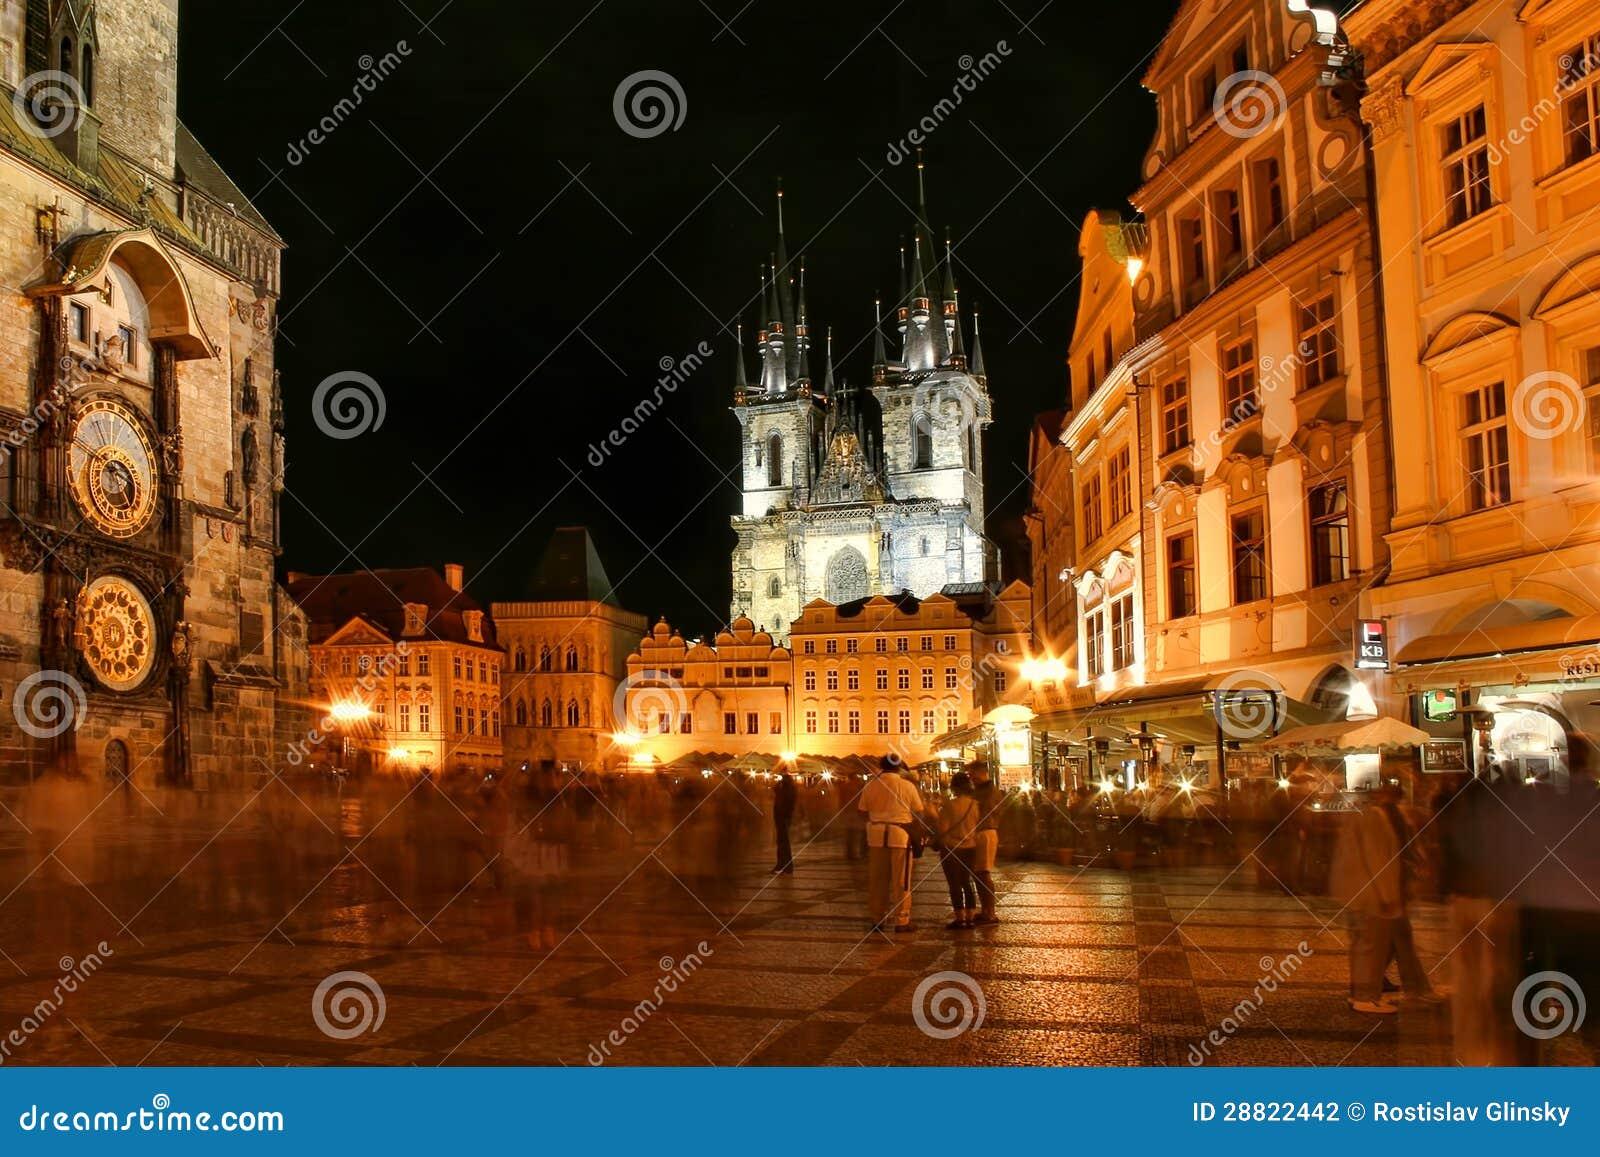 Prague city center at night editorial photography image for Prague center